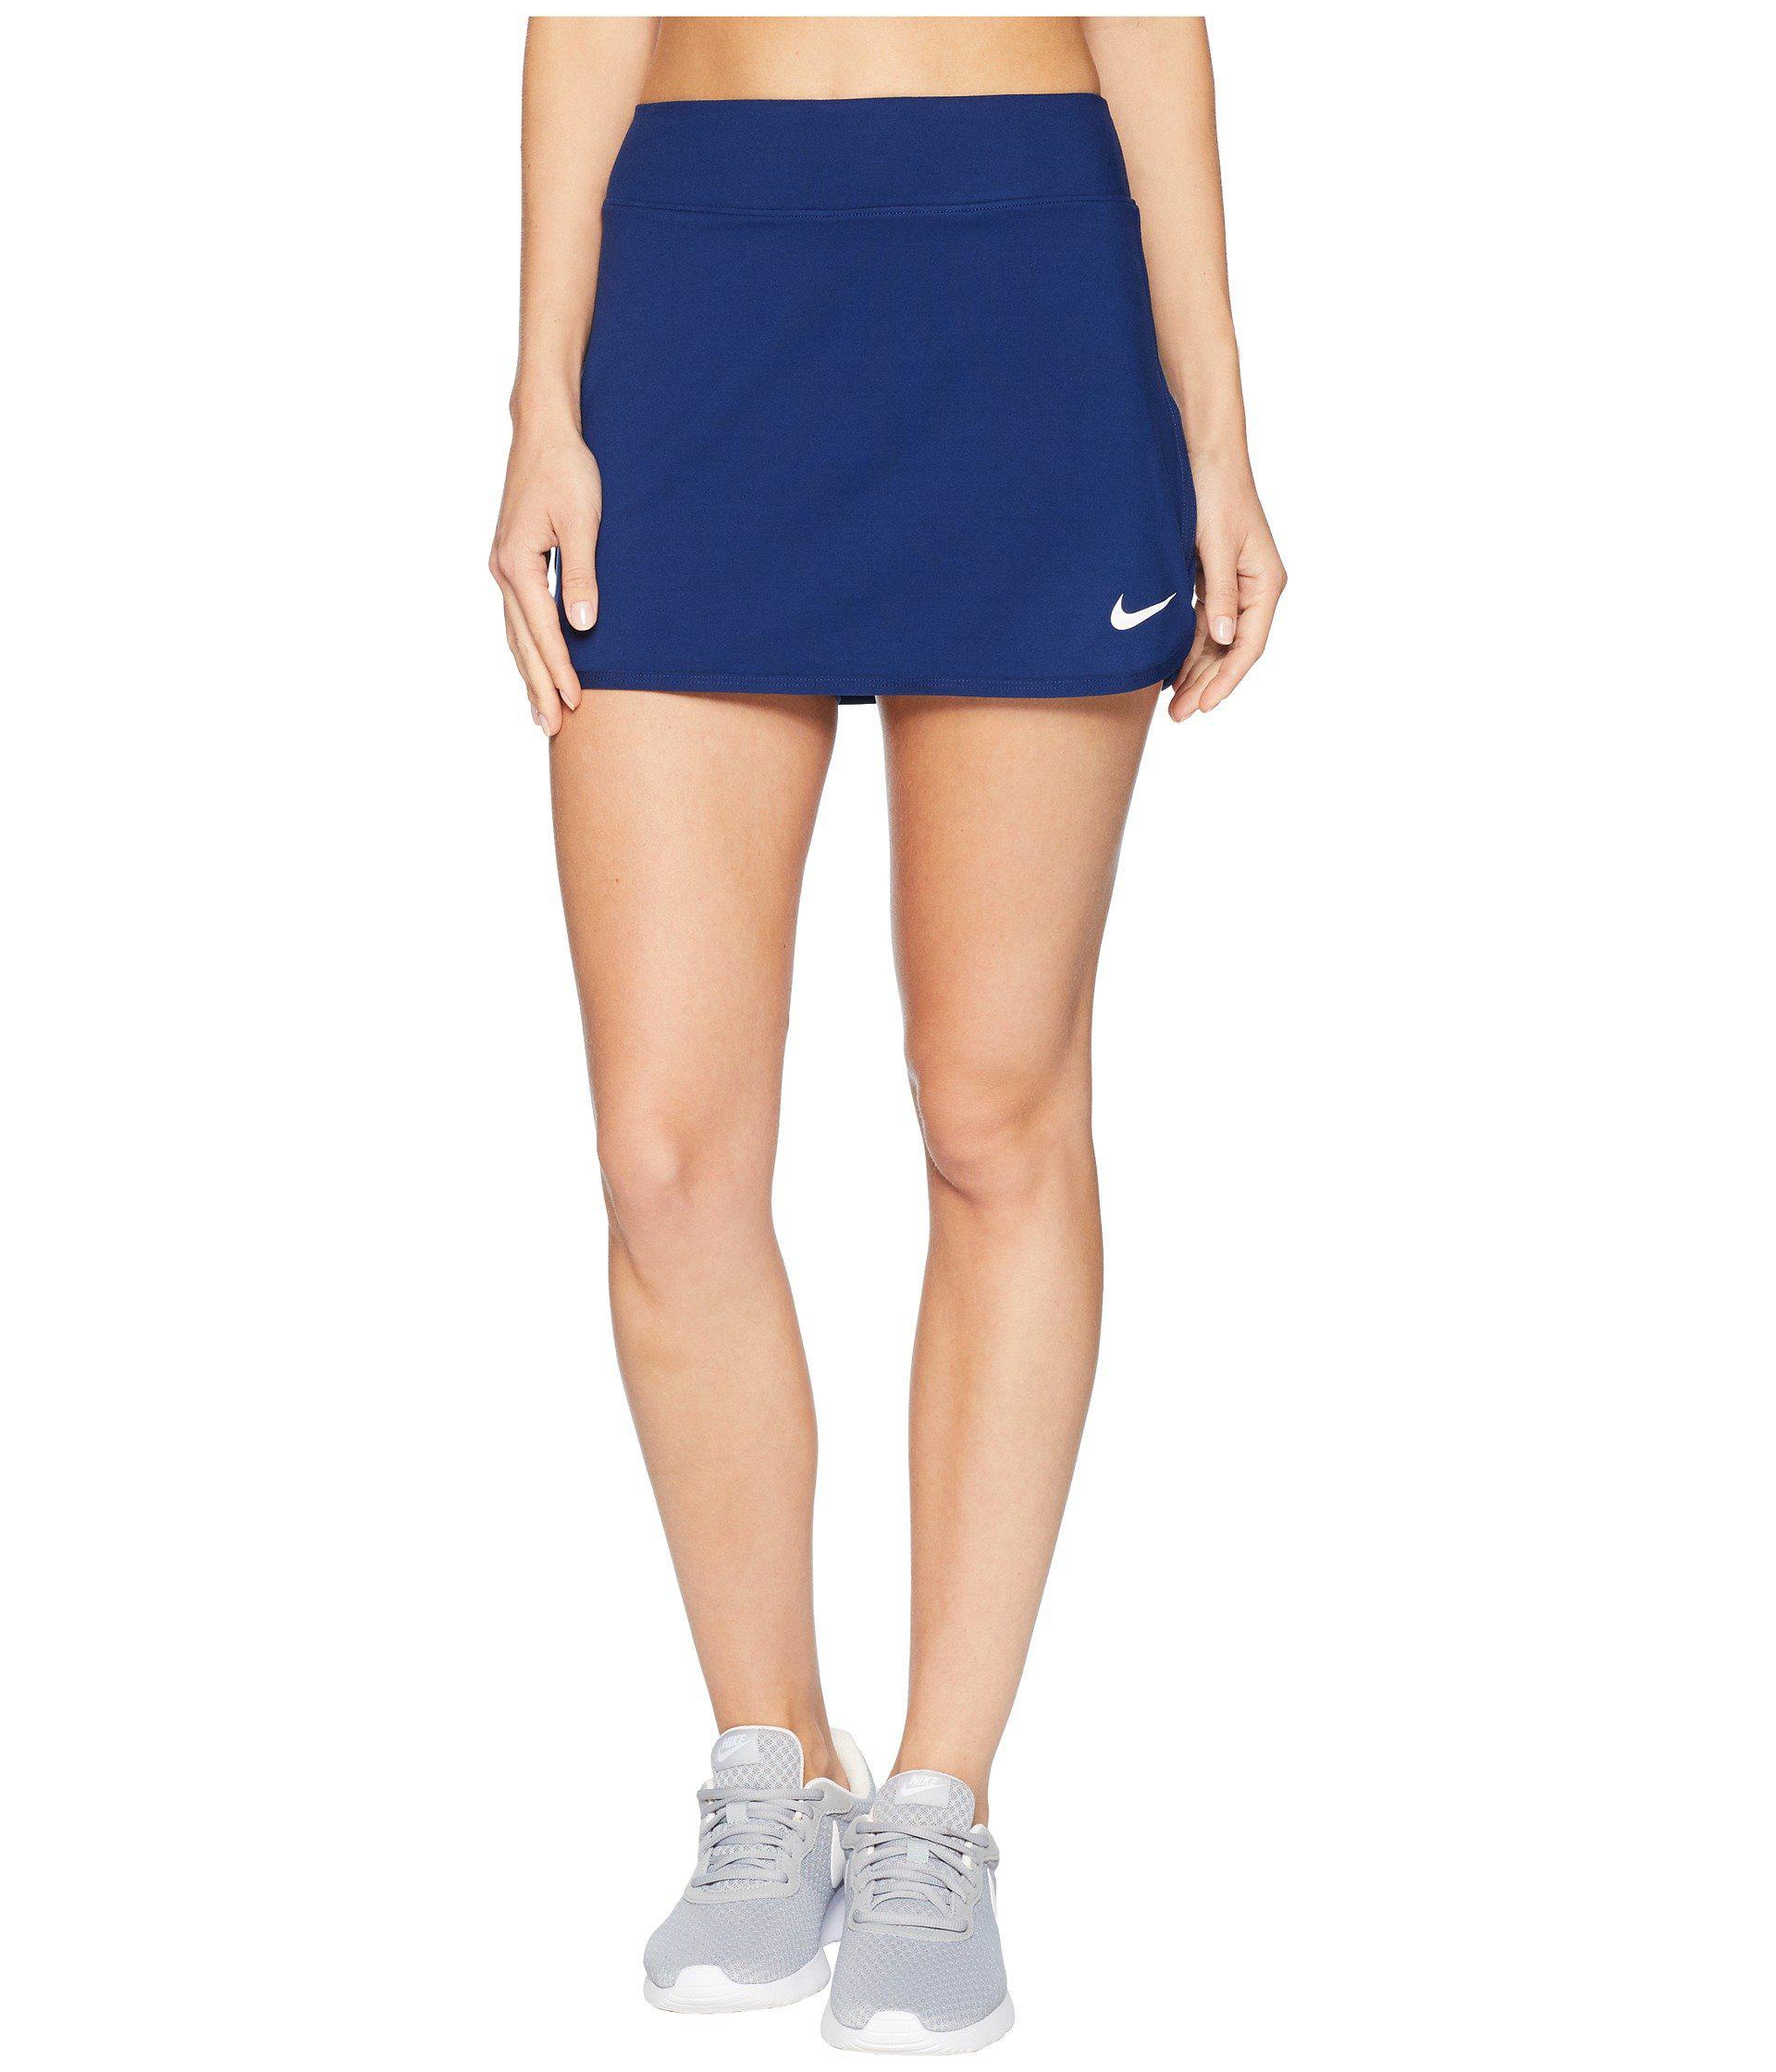 5d2136e11489 Lyst - Nike Court Pure Tennis Skirt in Blue